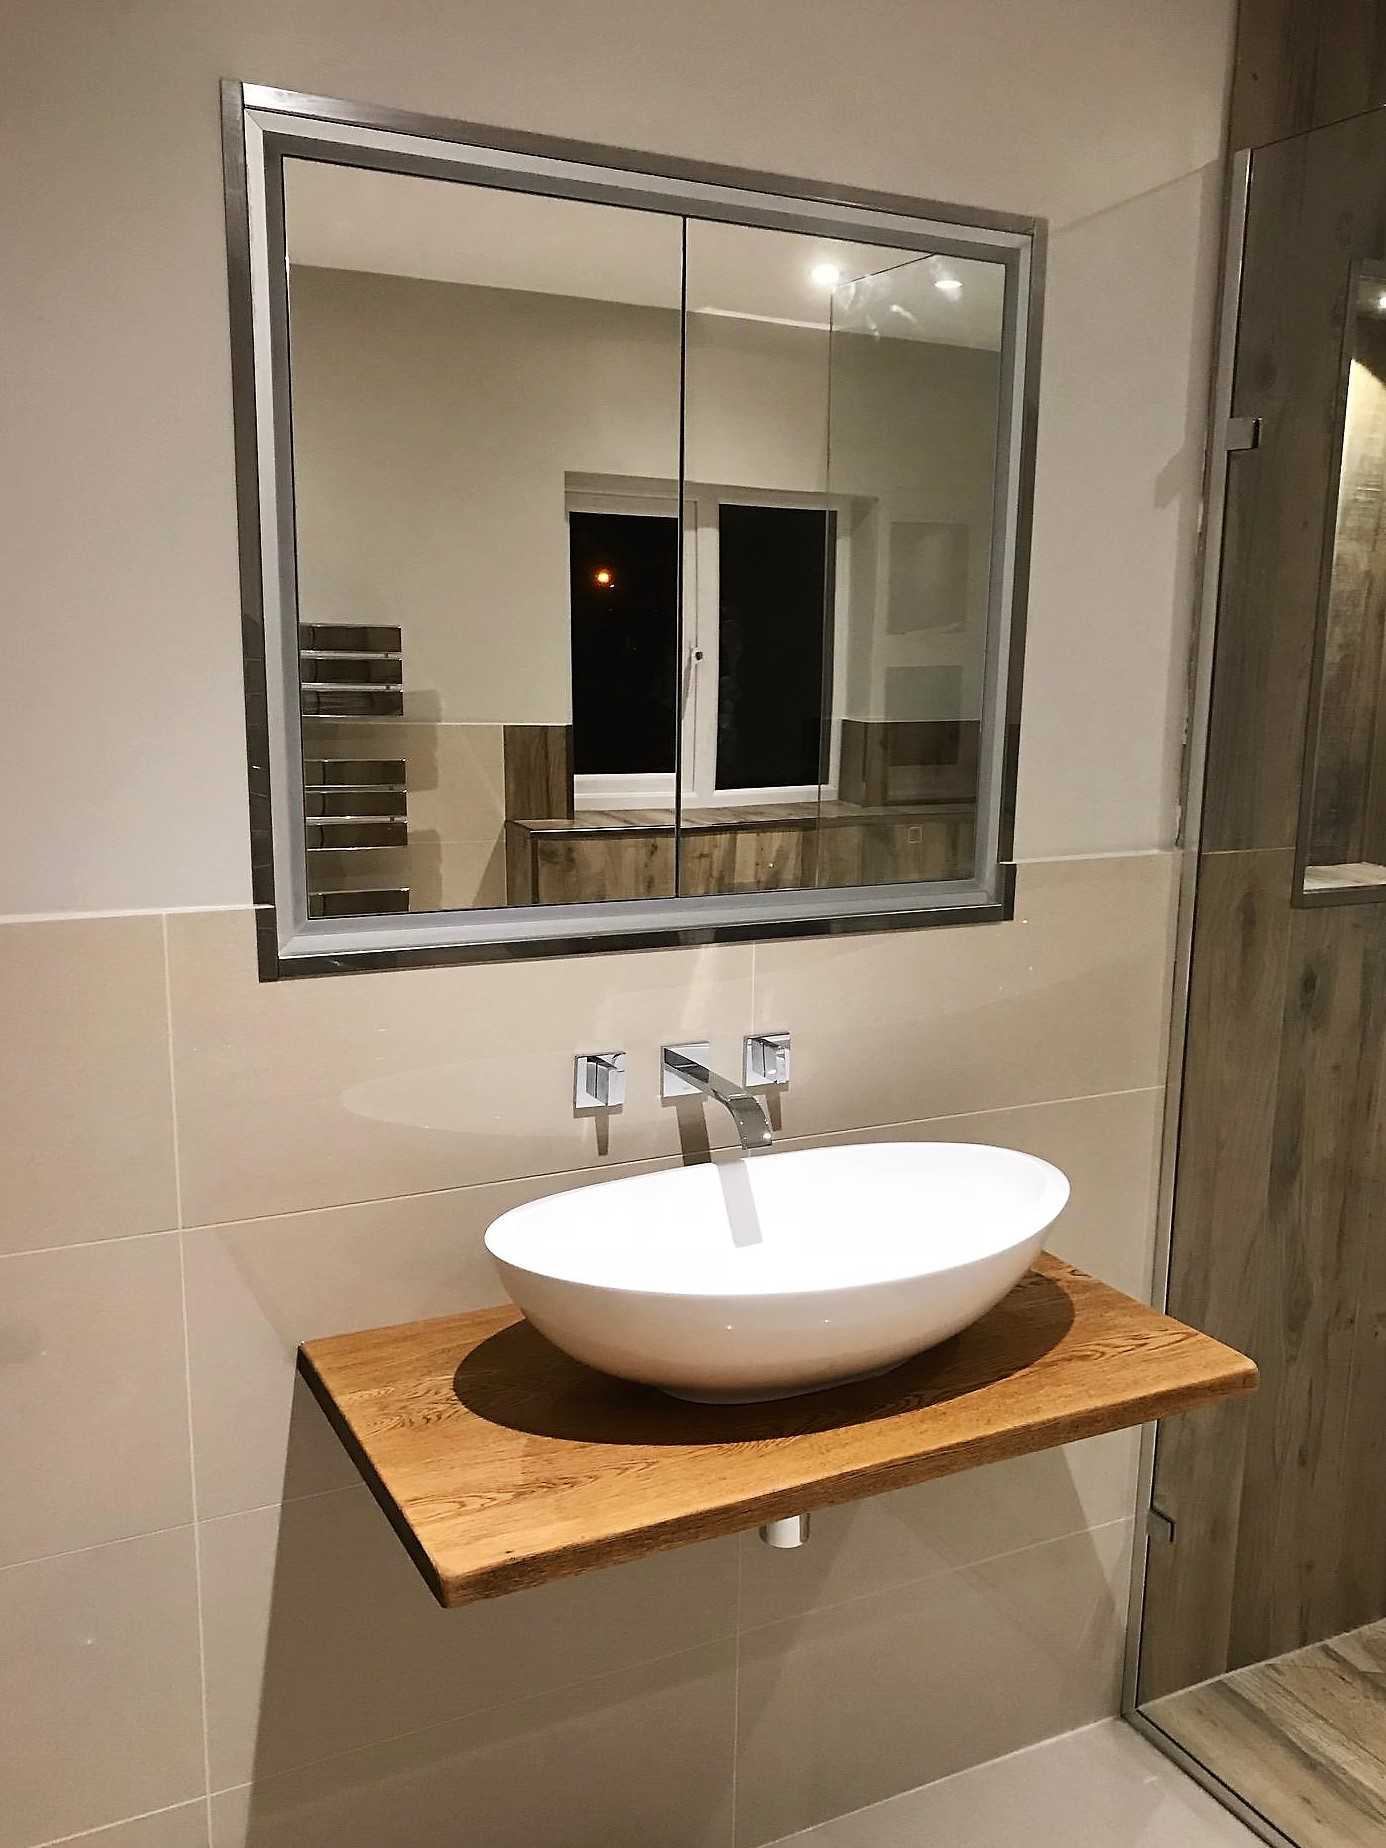 Bathrooms (3)